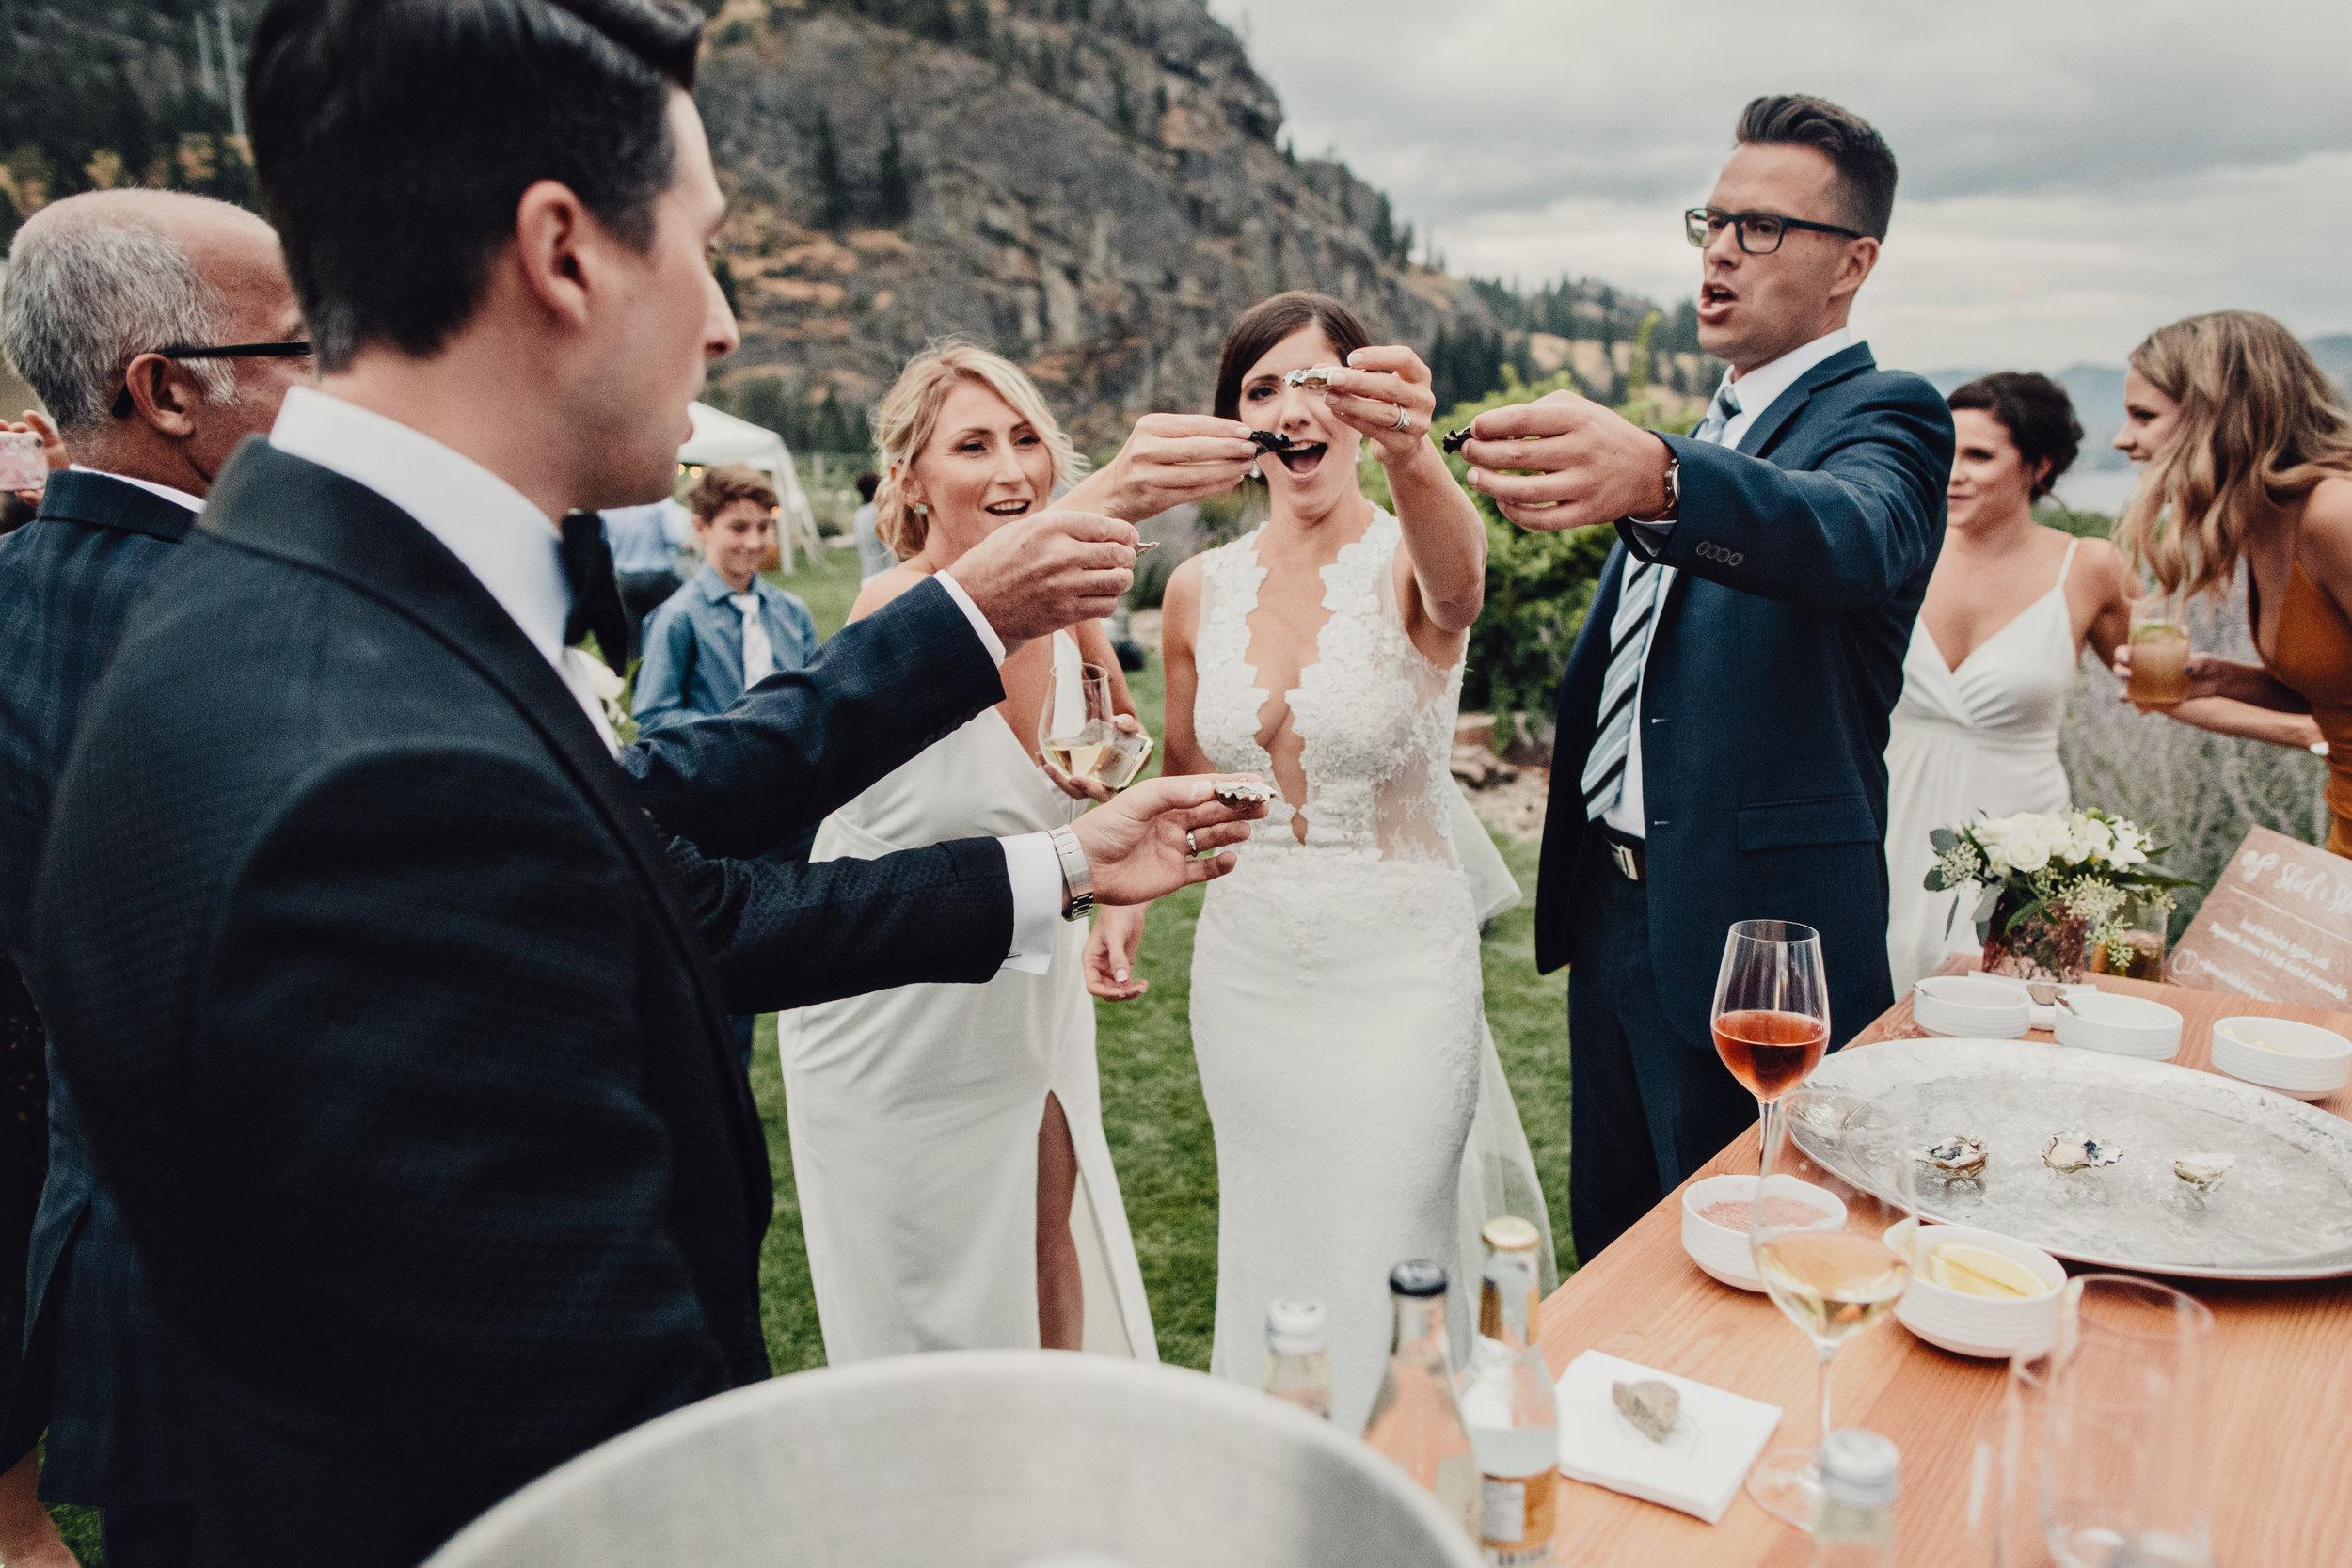 taylor-roades-wedding-0283.JPG